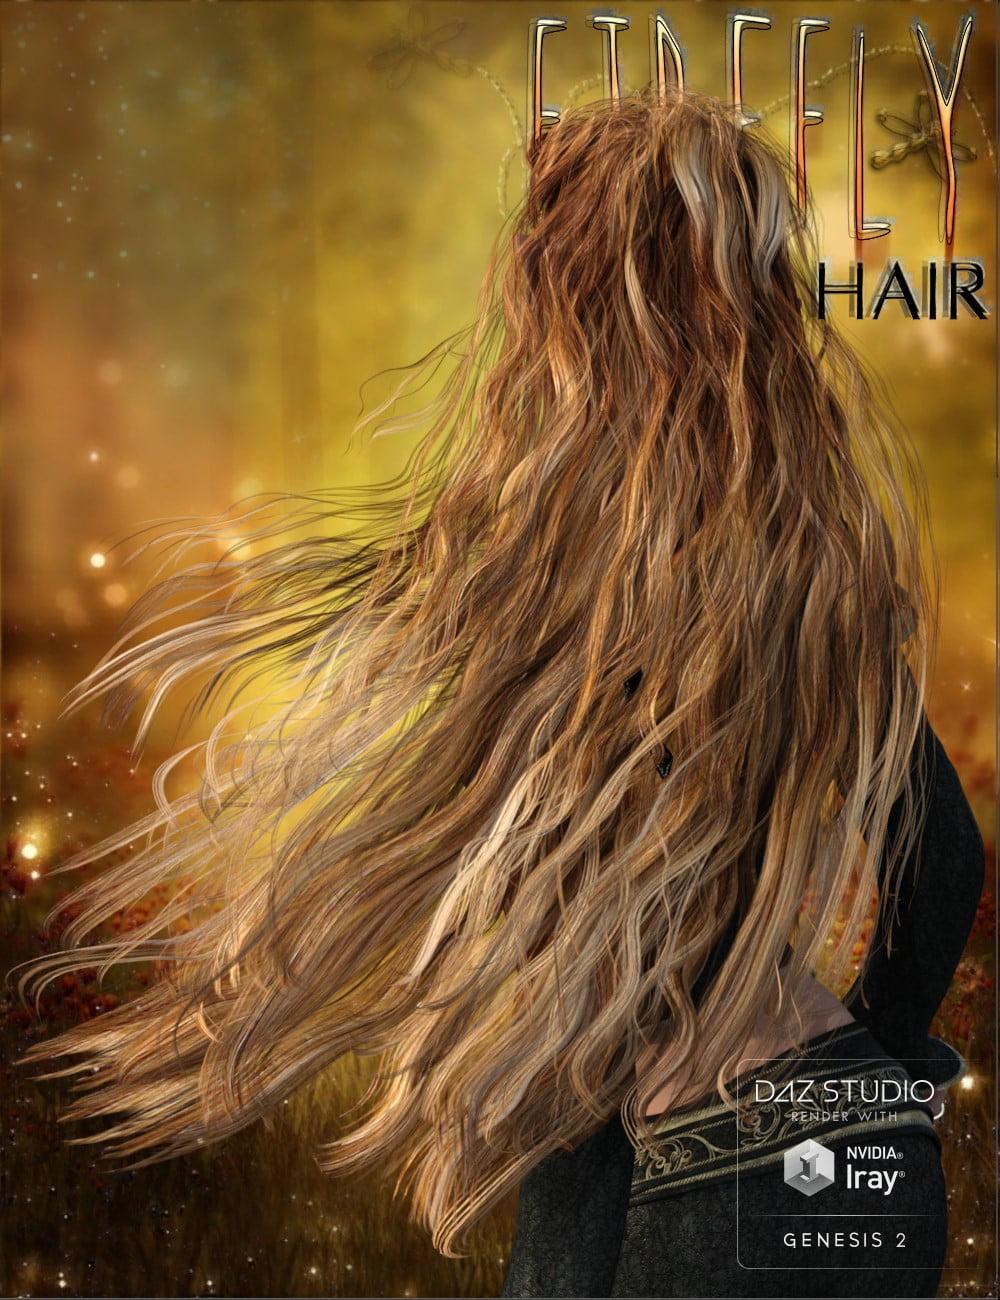 10-firefly-hair-for-v4-and-genesis-2-females-daz3d